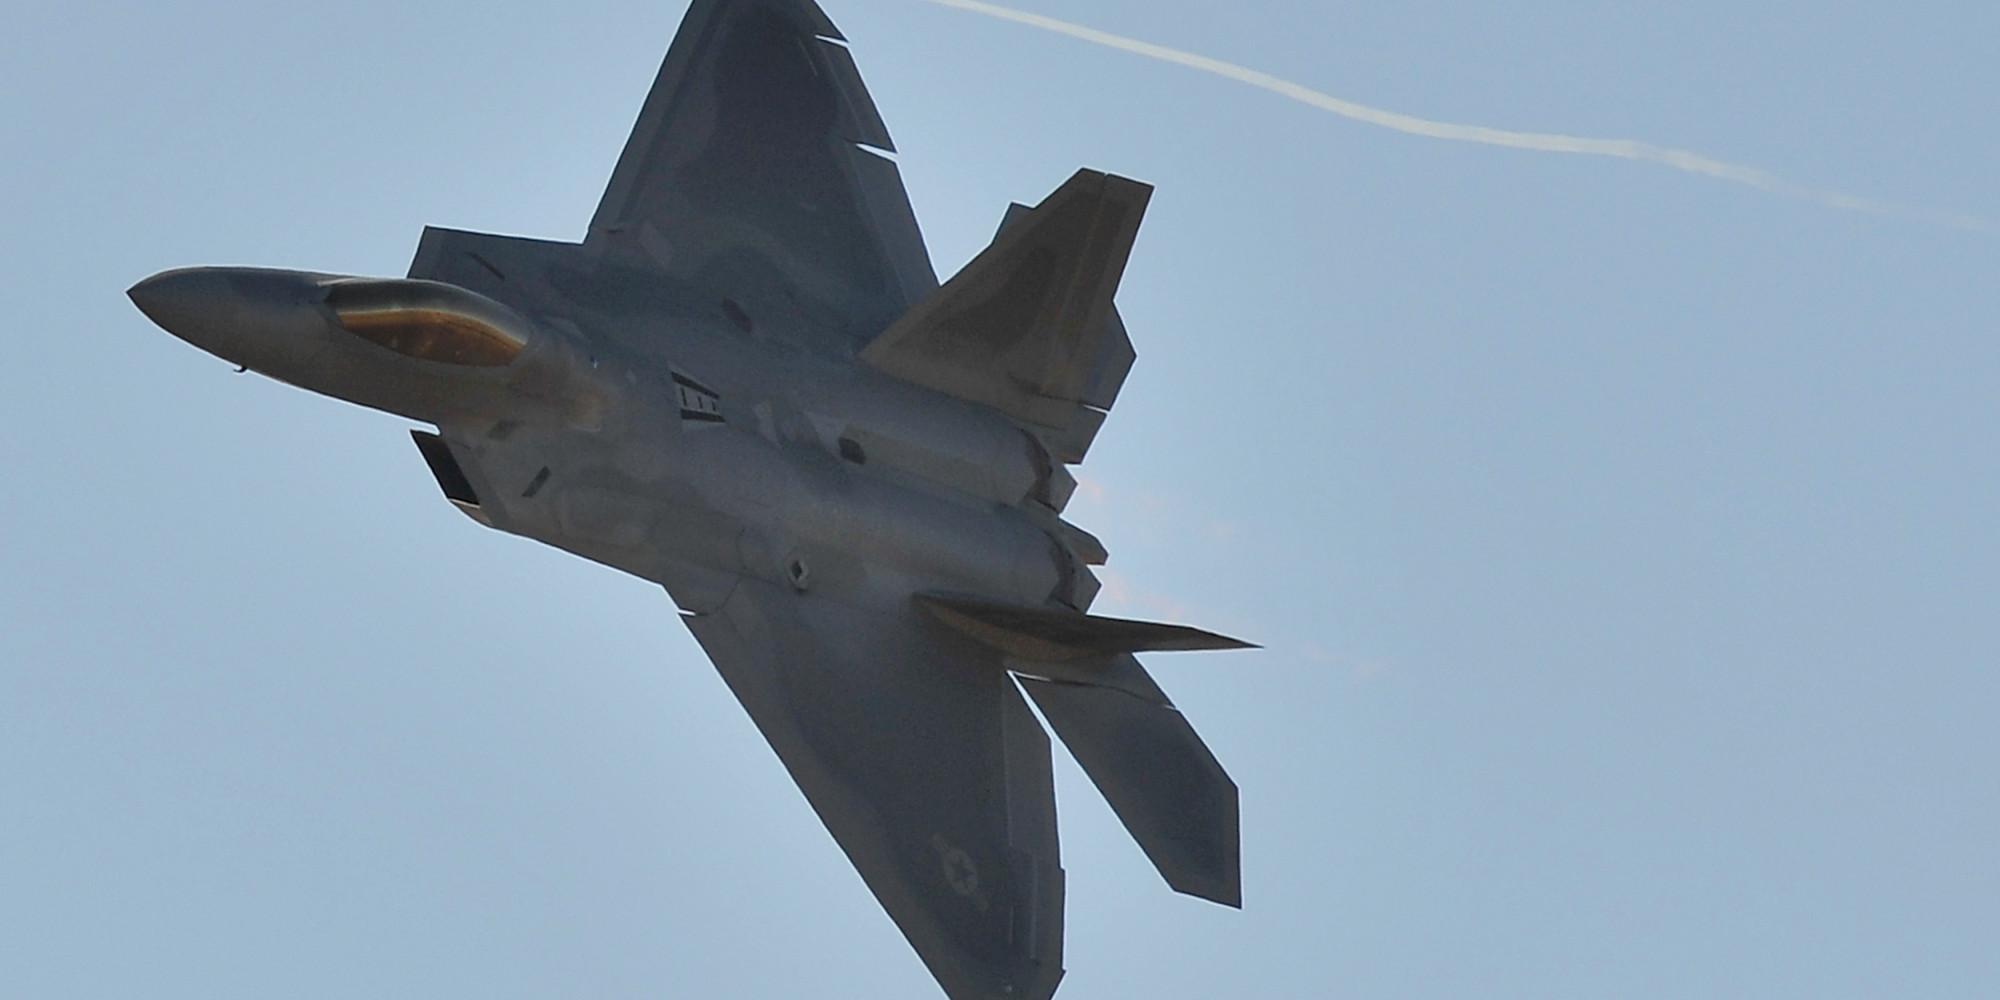 U.S. Fighter Jets Intercept Russian Aircraft